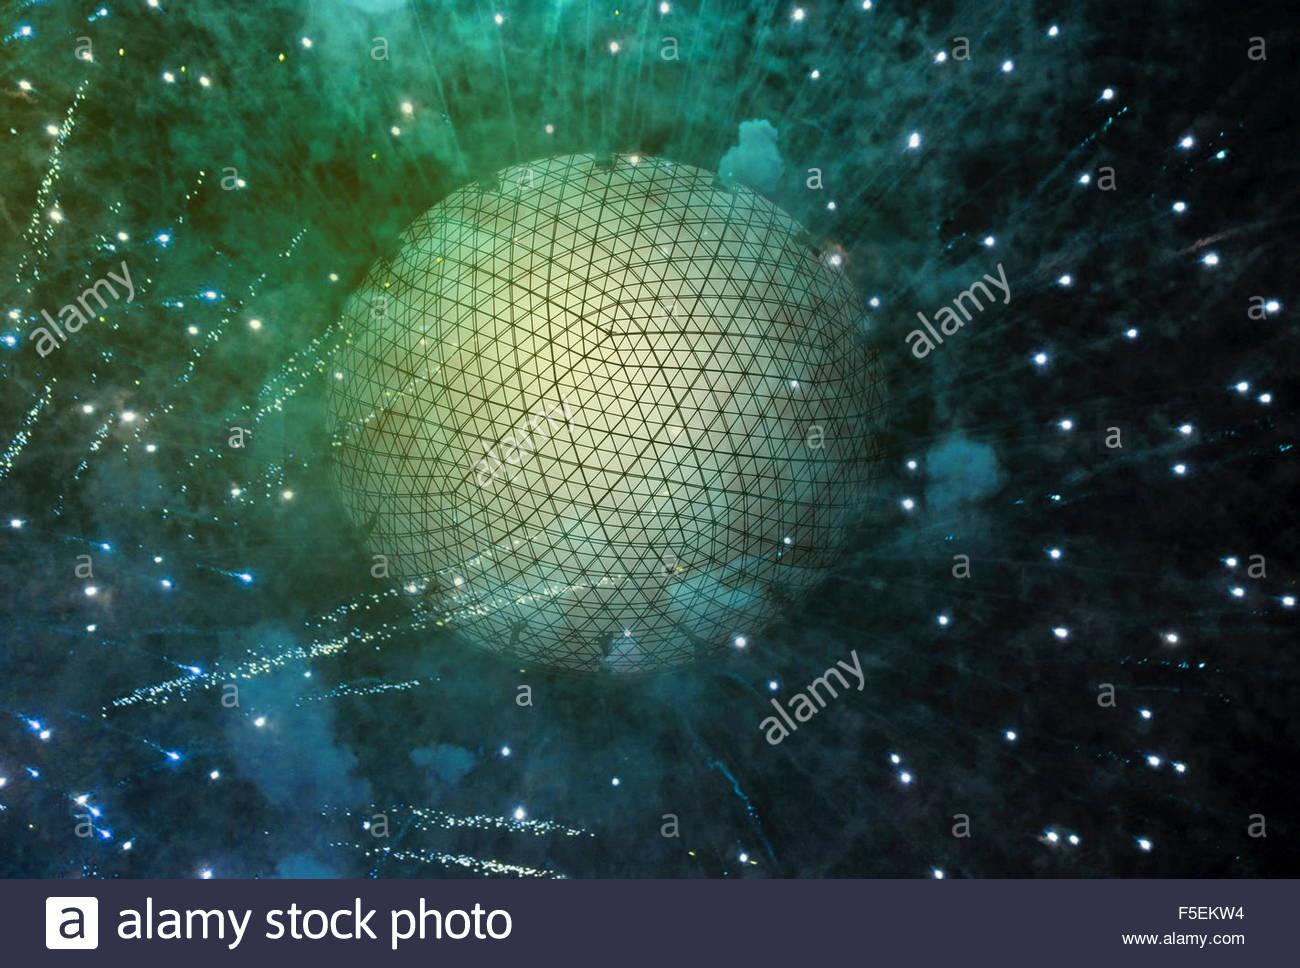 Grid pattern over exploding sphere - Stock Image